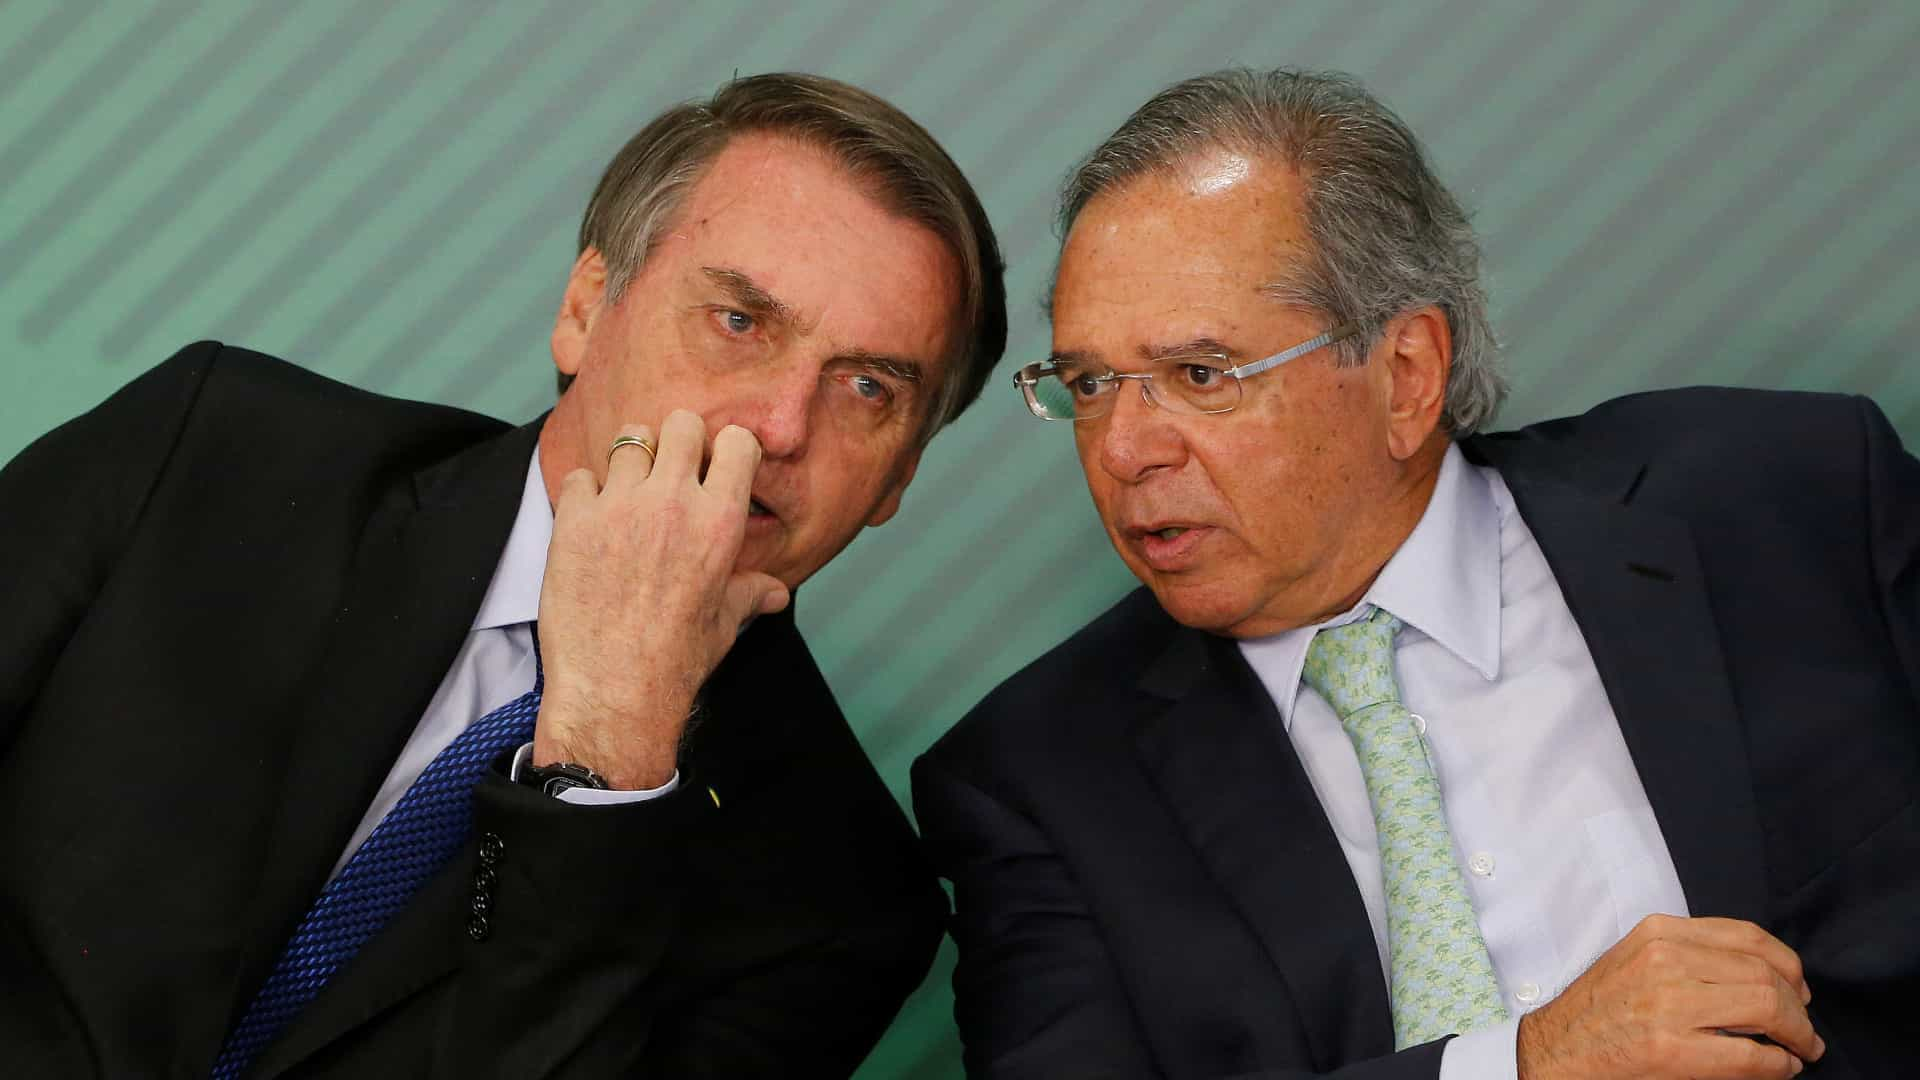 Repaginada, CPMF volta ao debate na reforma tributária